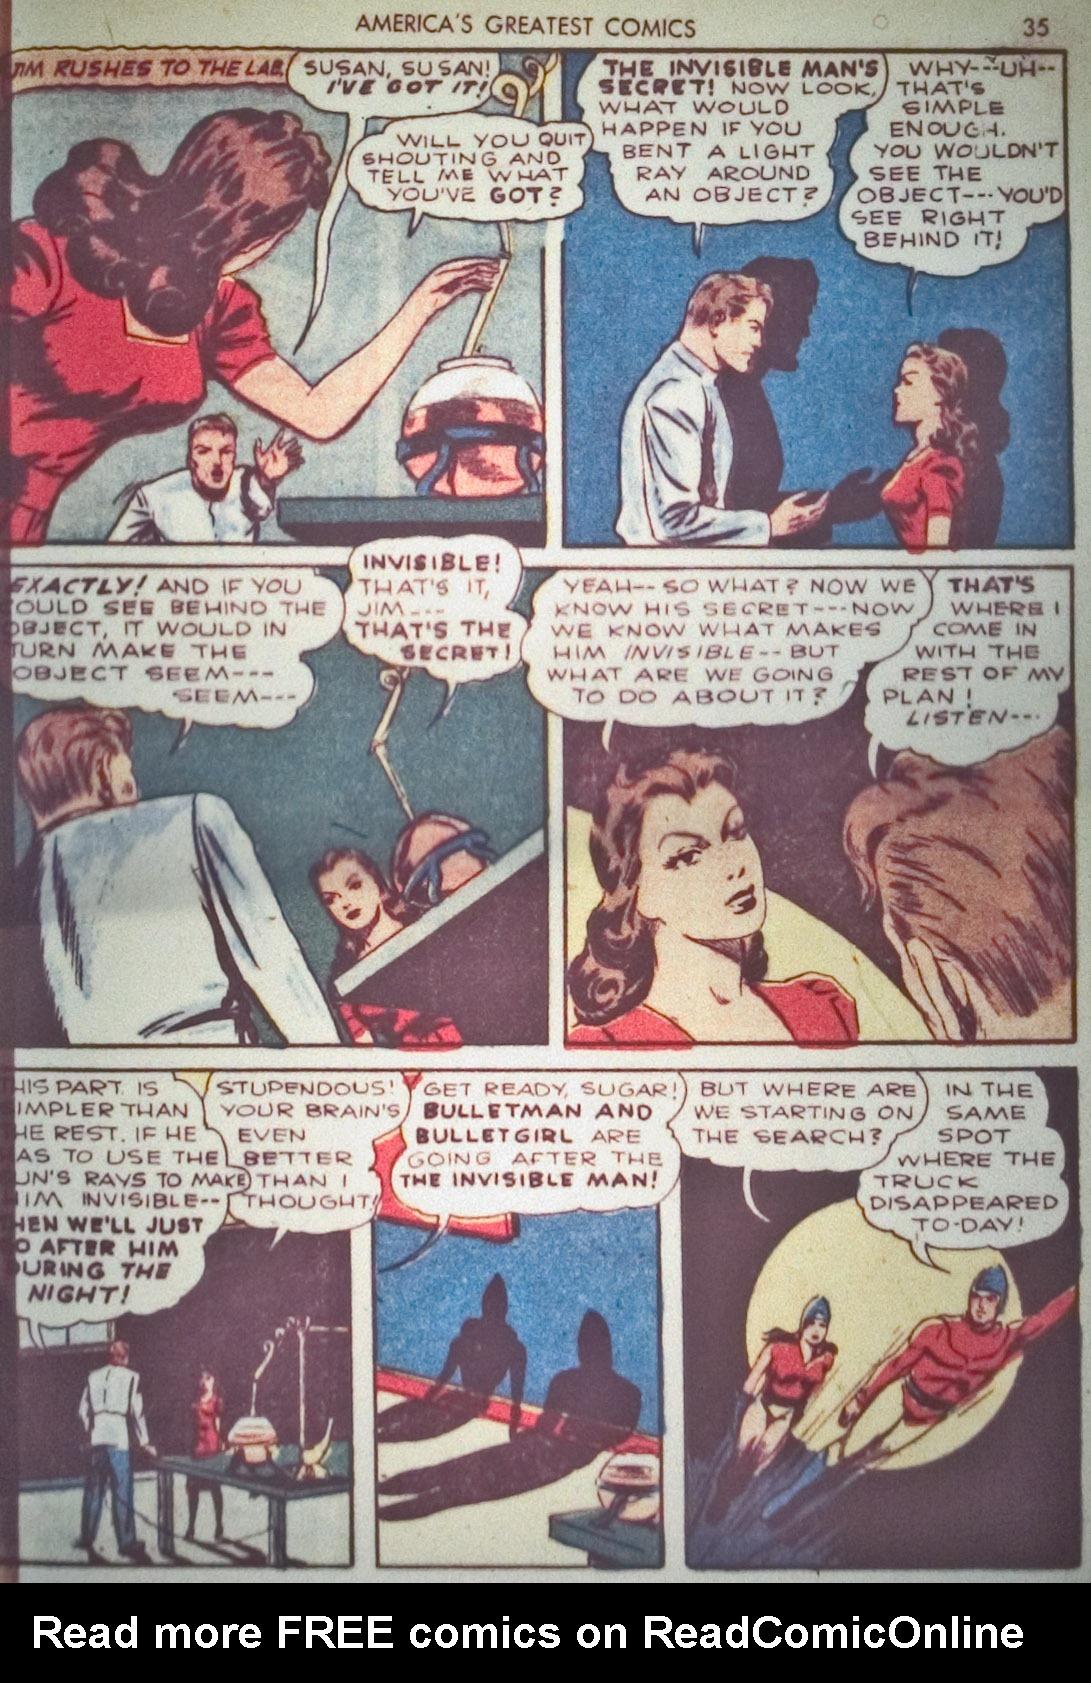 Read online America's Greatest Comics comic -  Issue #1 - 38